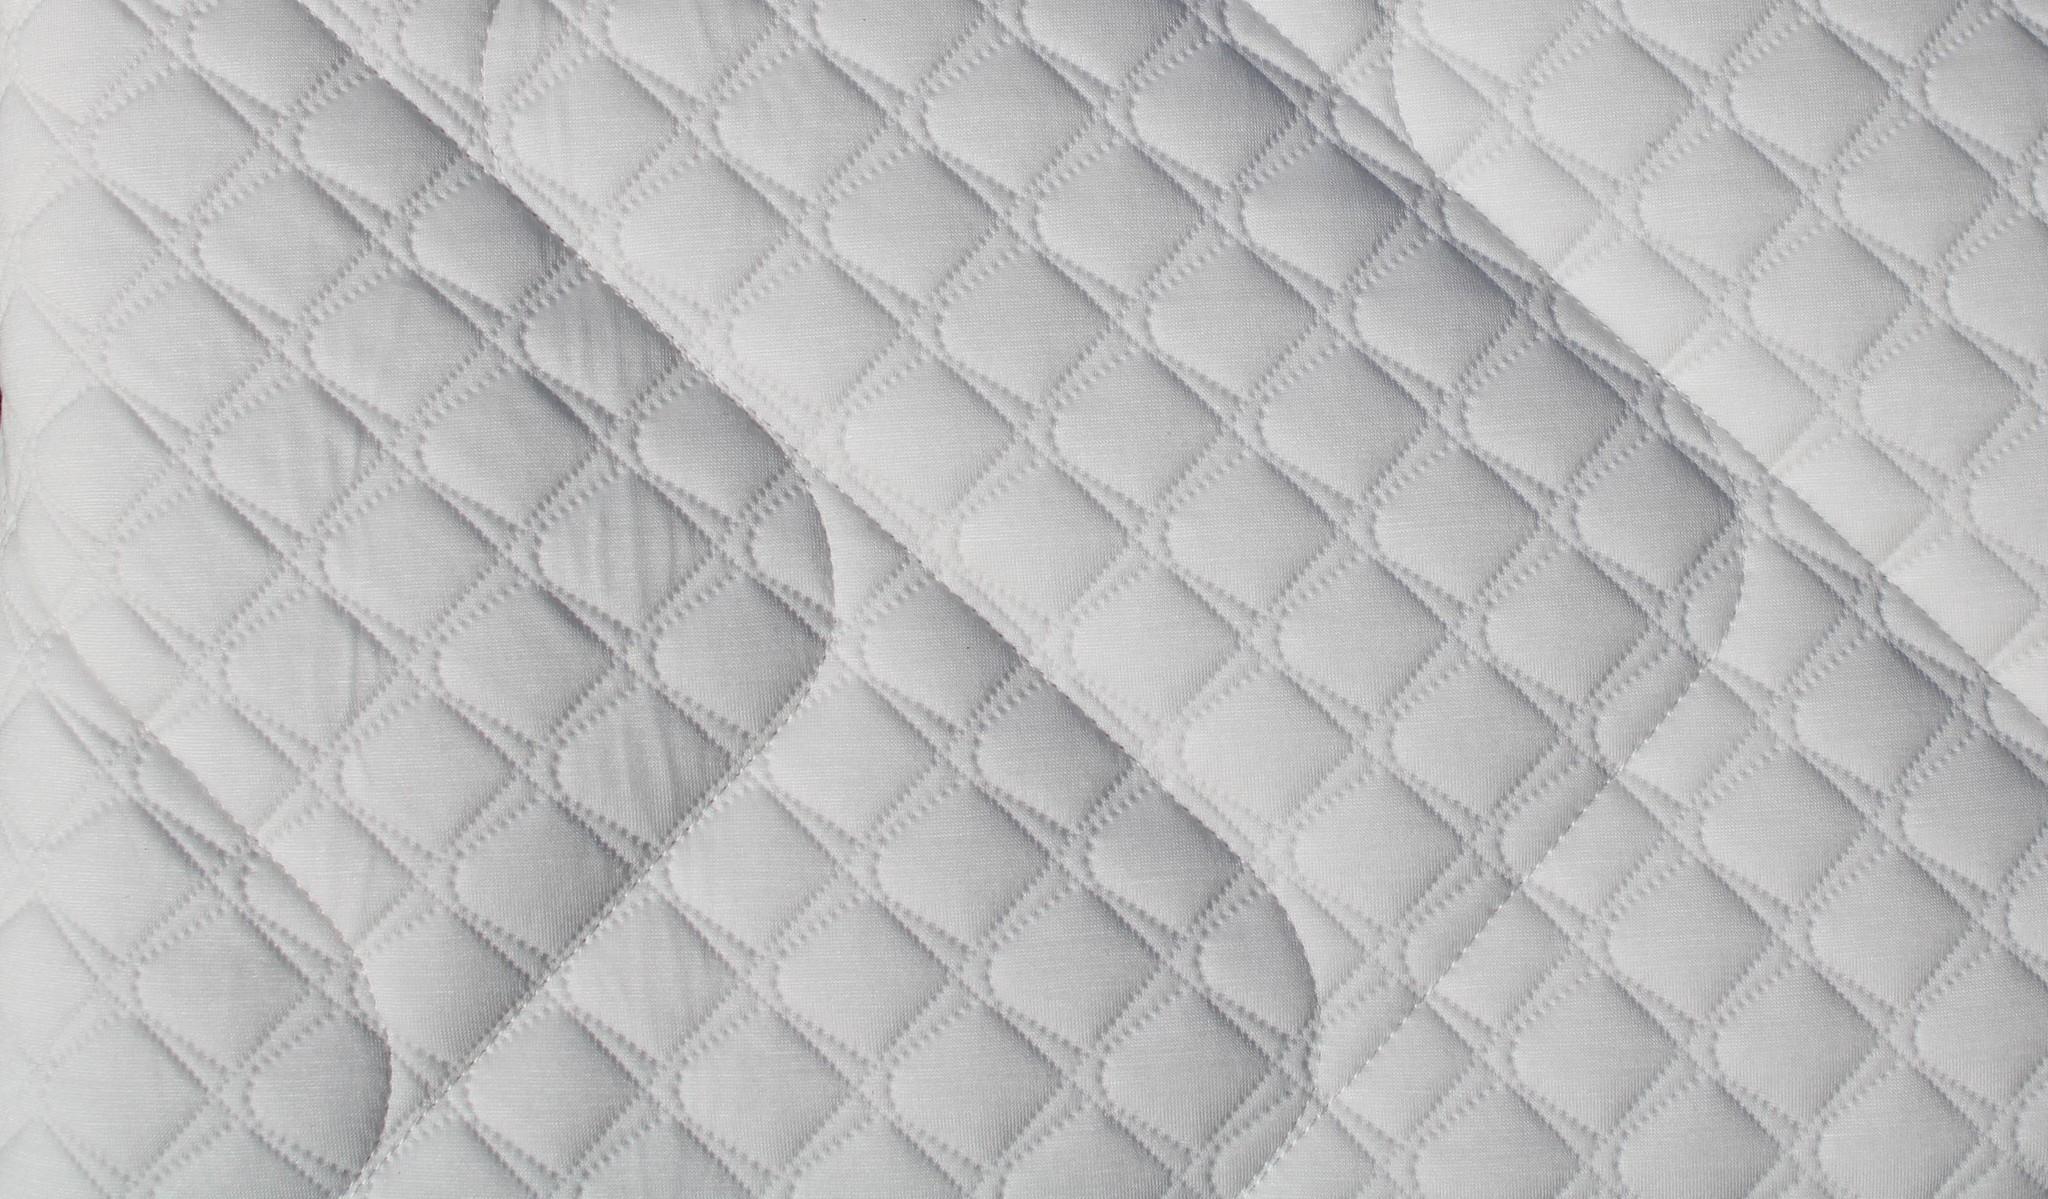 Sarpy Kindermatras 80x160 Sertel Tailor Made Mattress